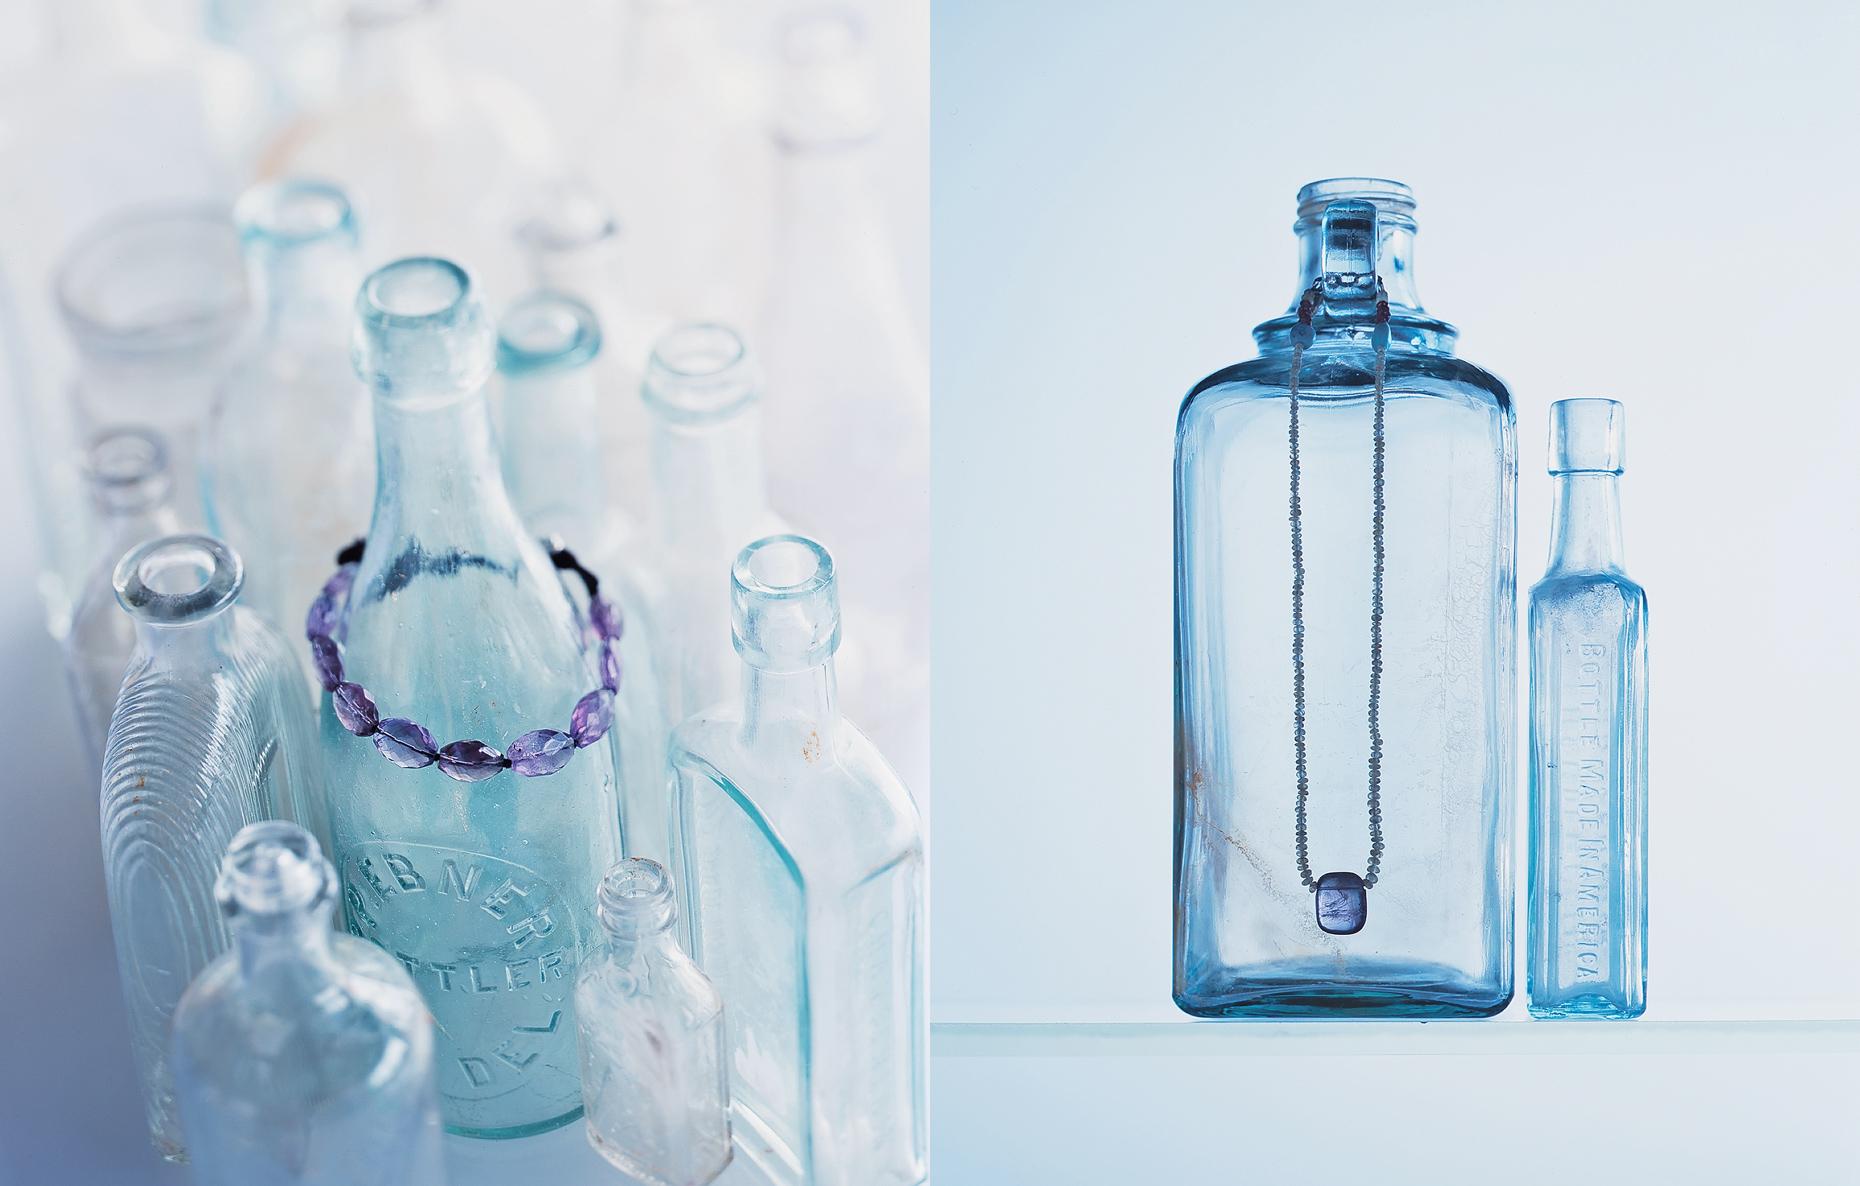 Product photography Jewelry Derek Israelsen Bracelet Necklace Bottles